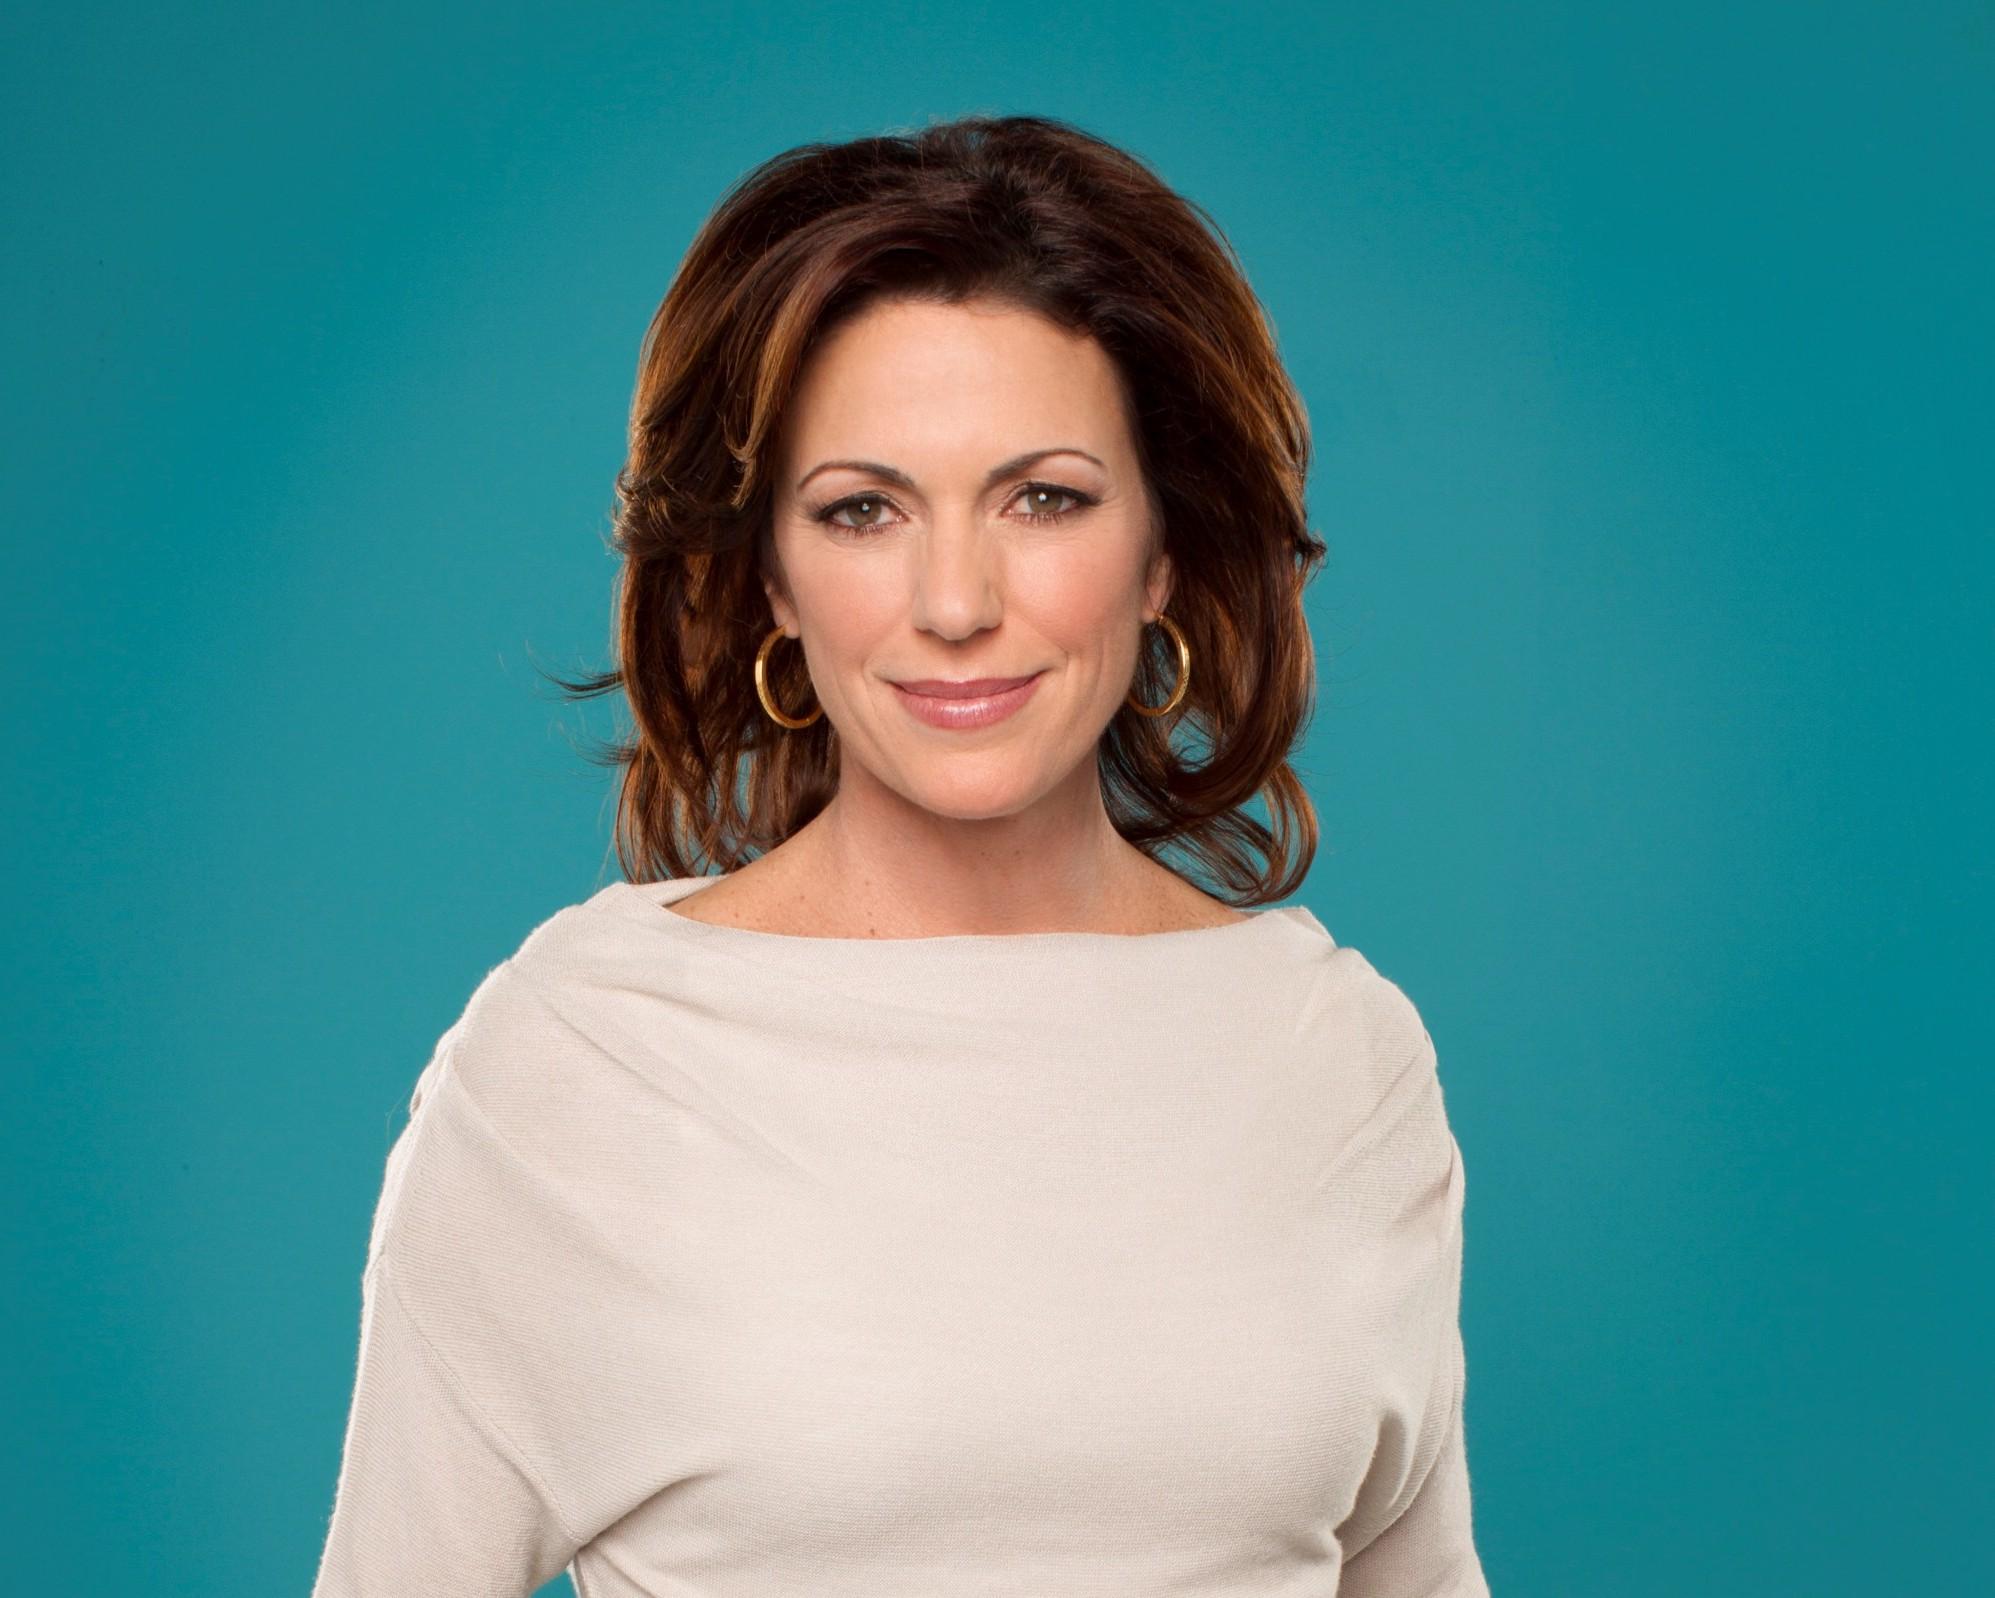 HLN & CNN Anchor, Kyra Phillips